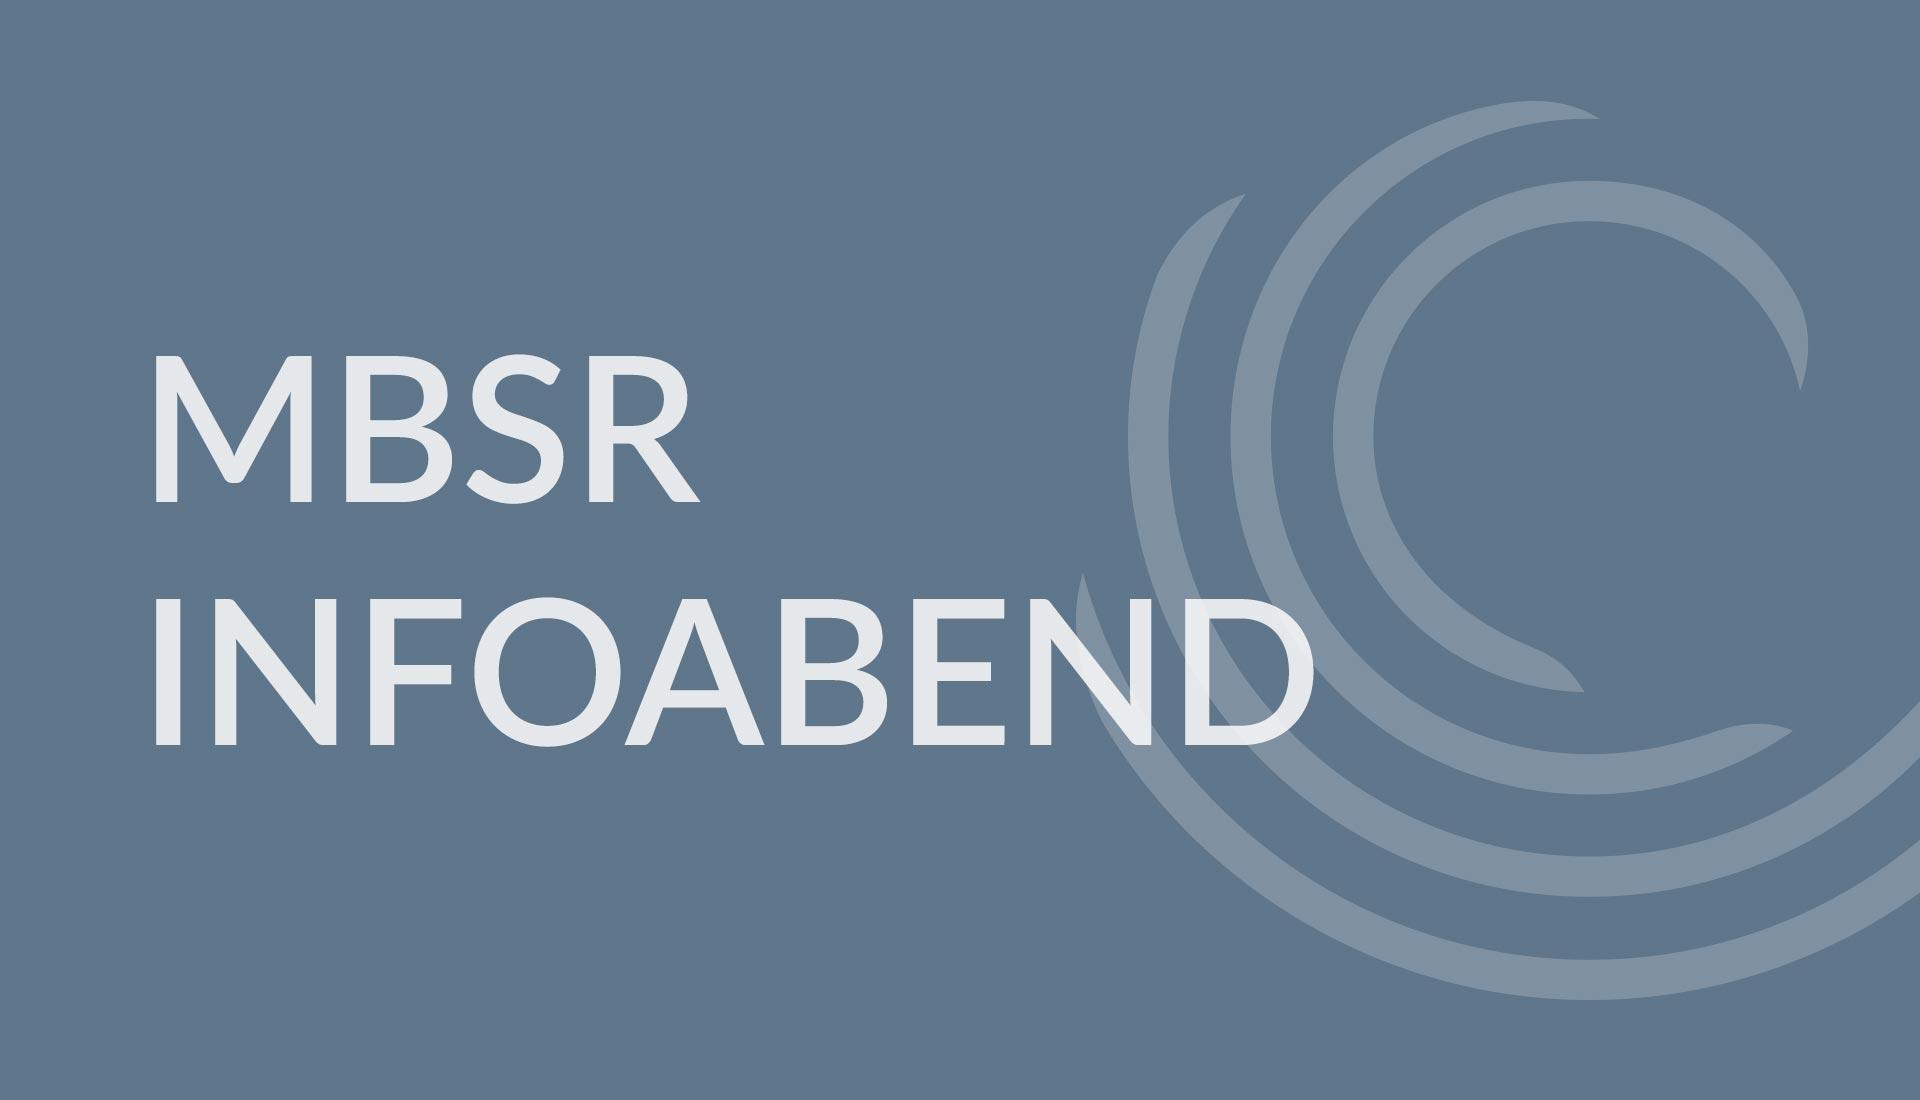 MBSR Infoabend mit Julia Seegebarteh